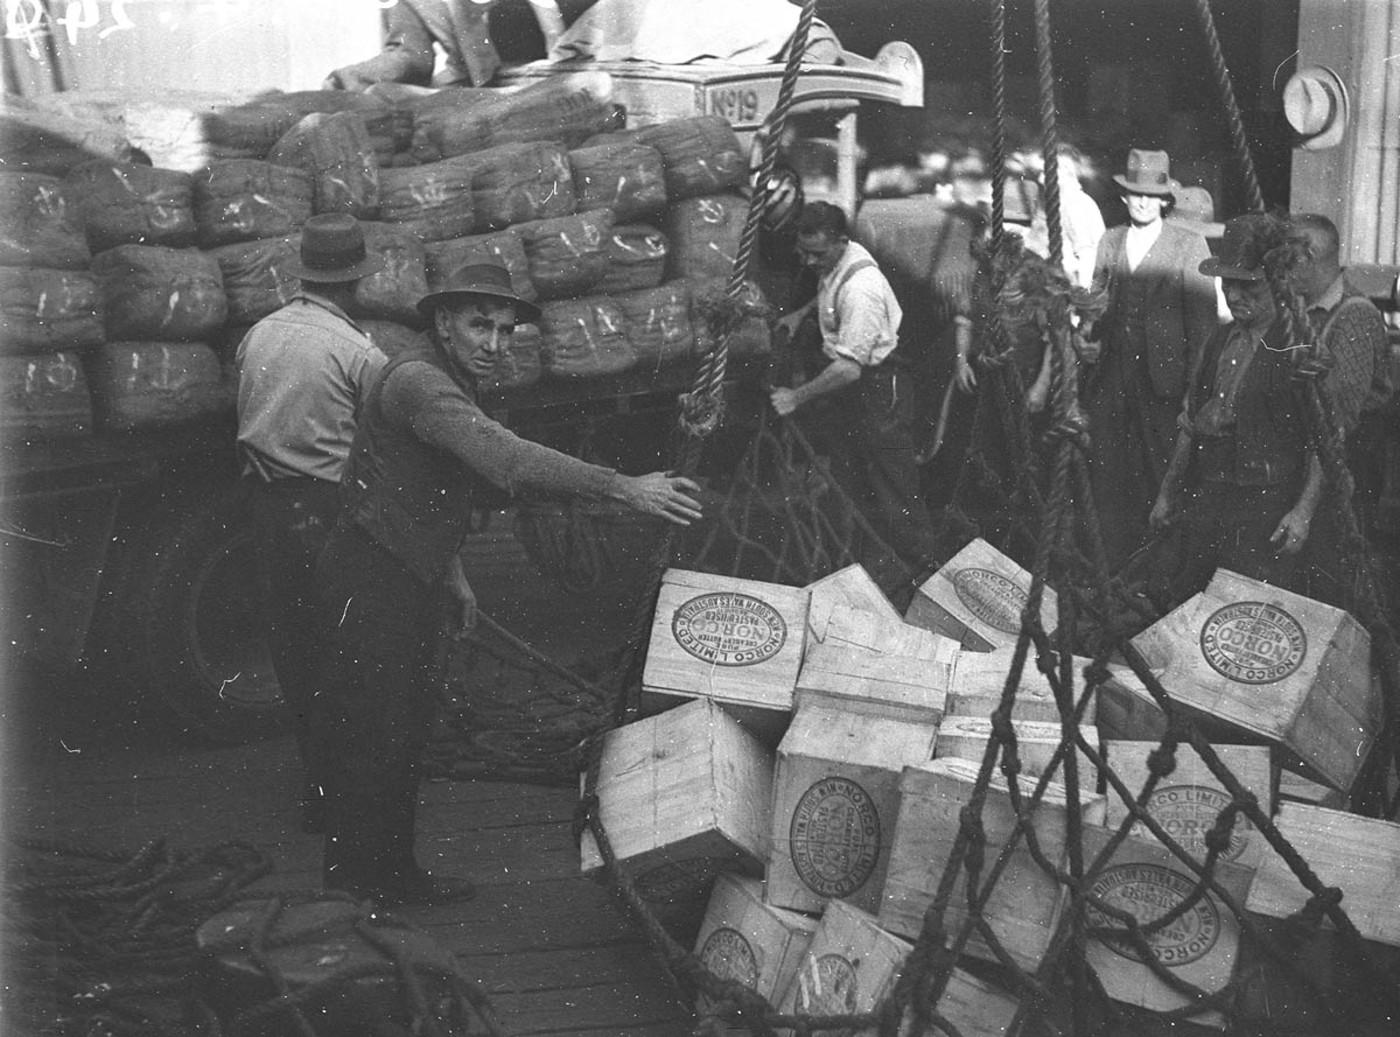 Loading a ship, Sydney Harbour 12 July 1934